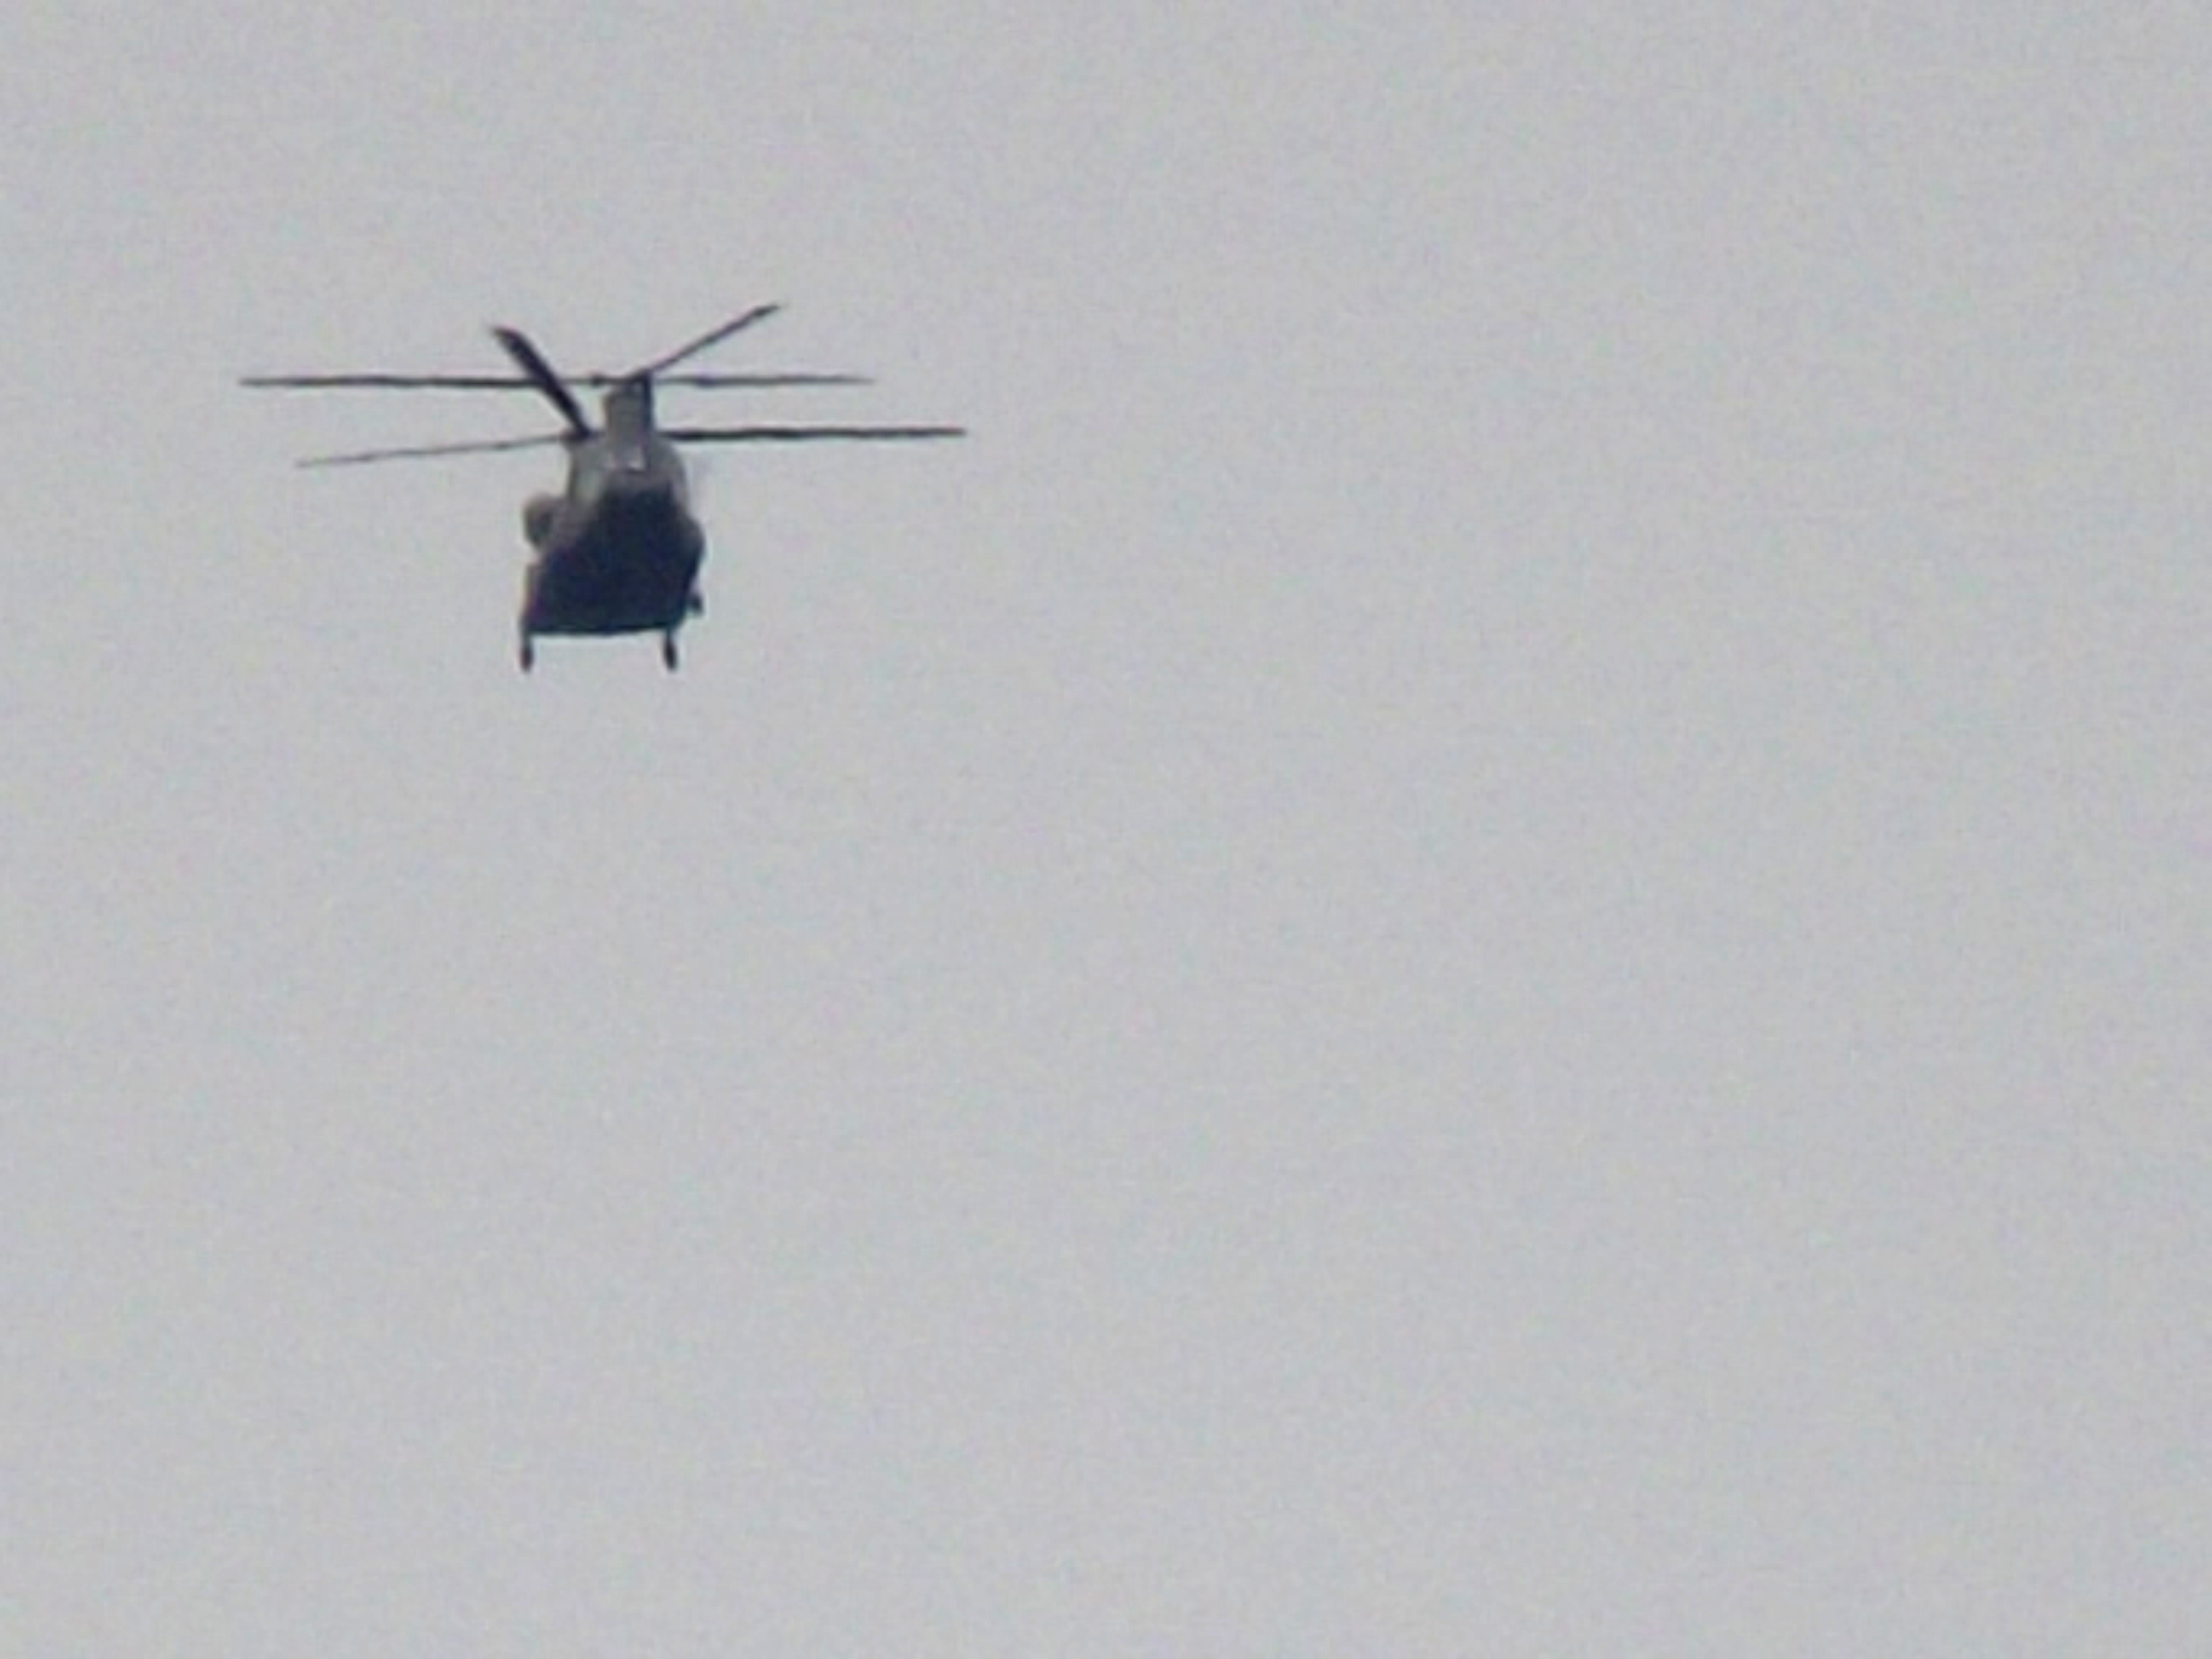 transporthubschrauber-ZA670-militaer-4236